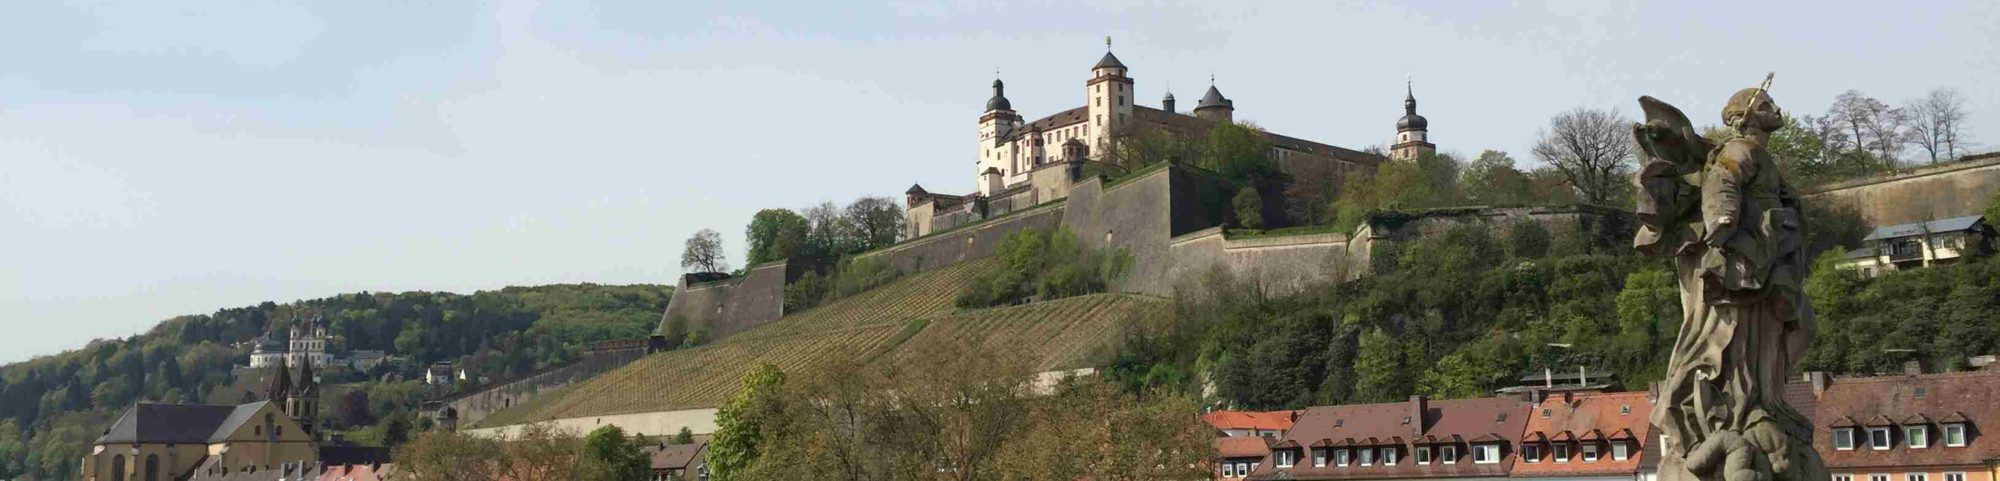 Old Tablers 87 Würzburg